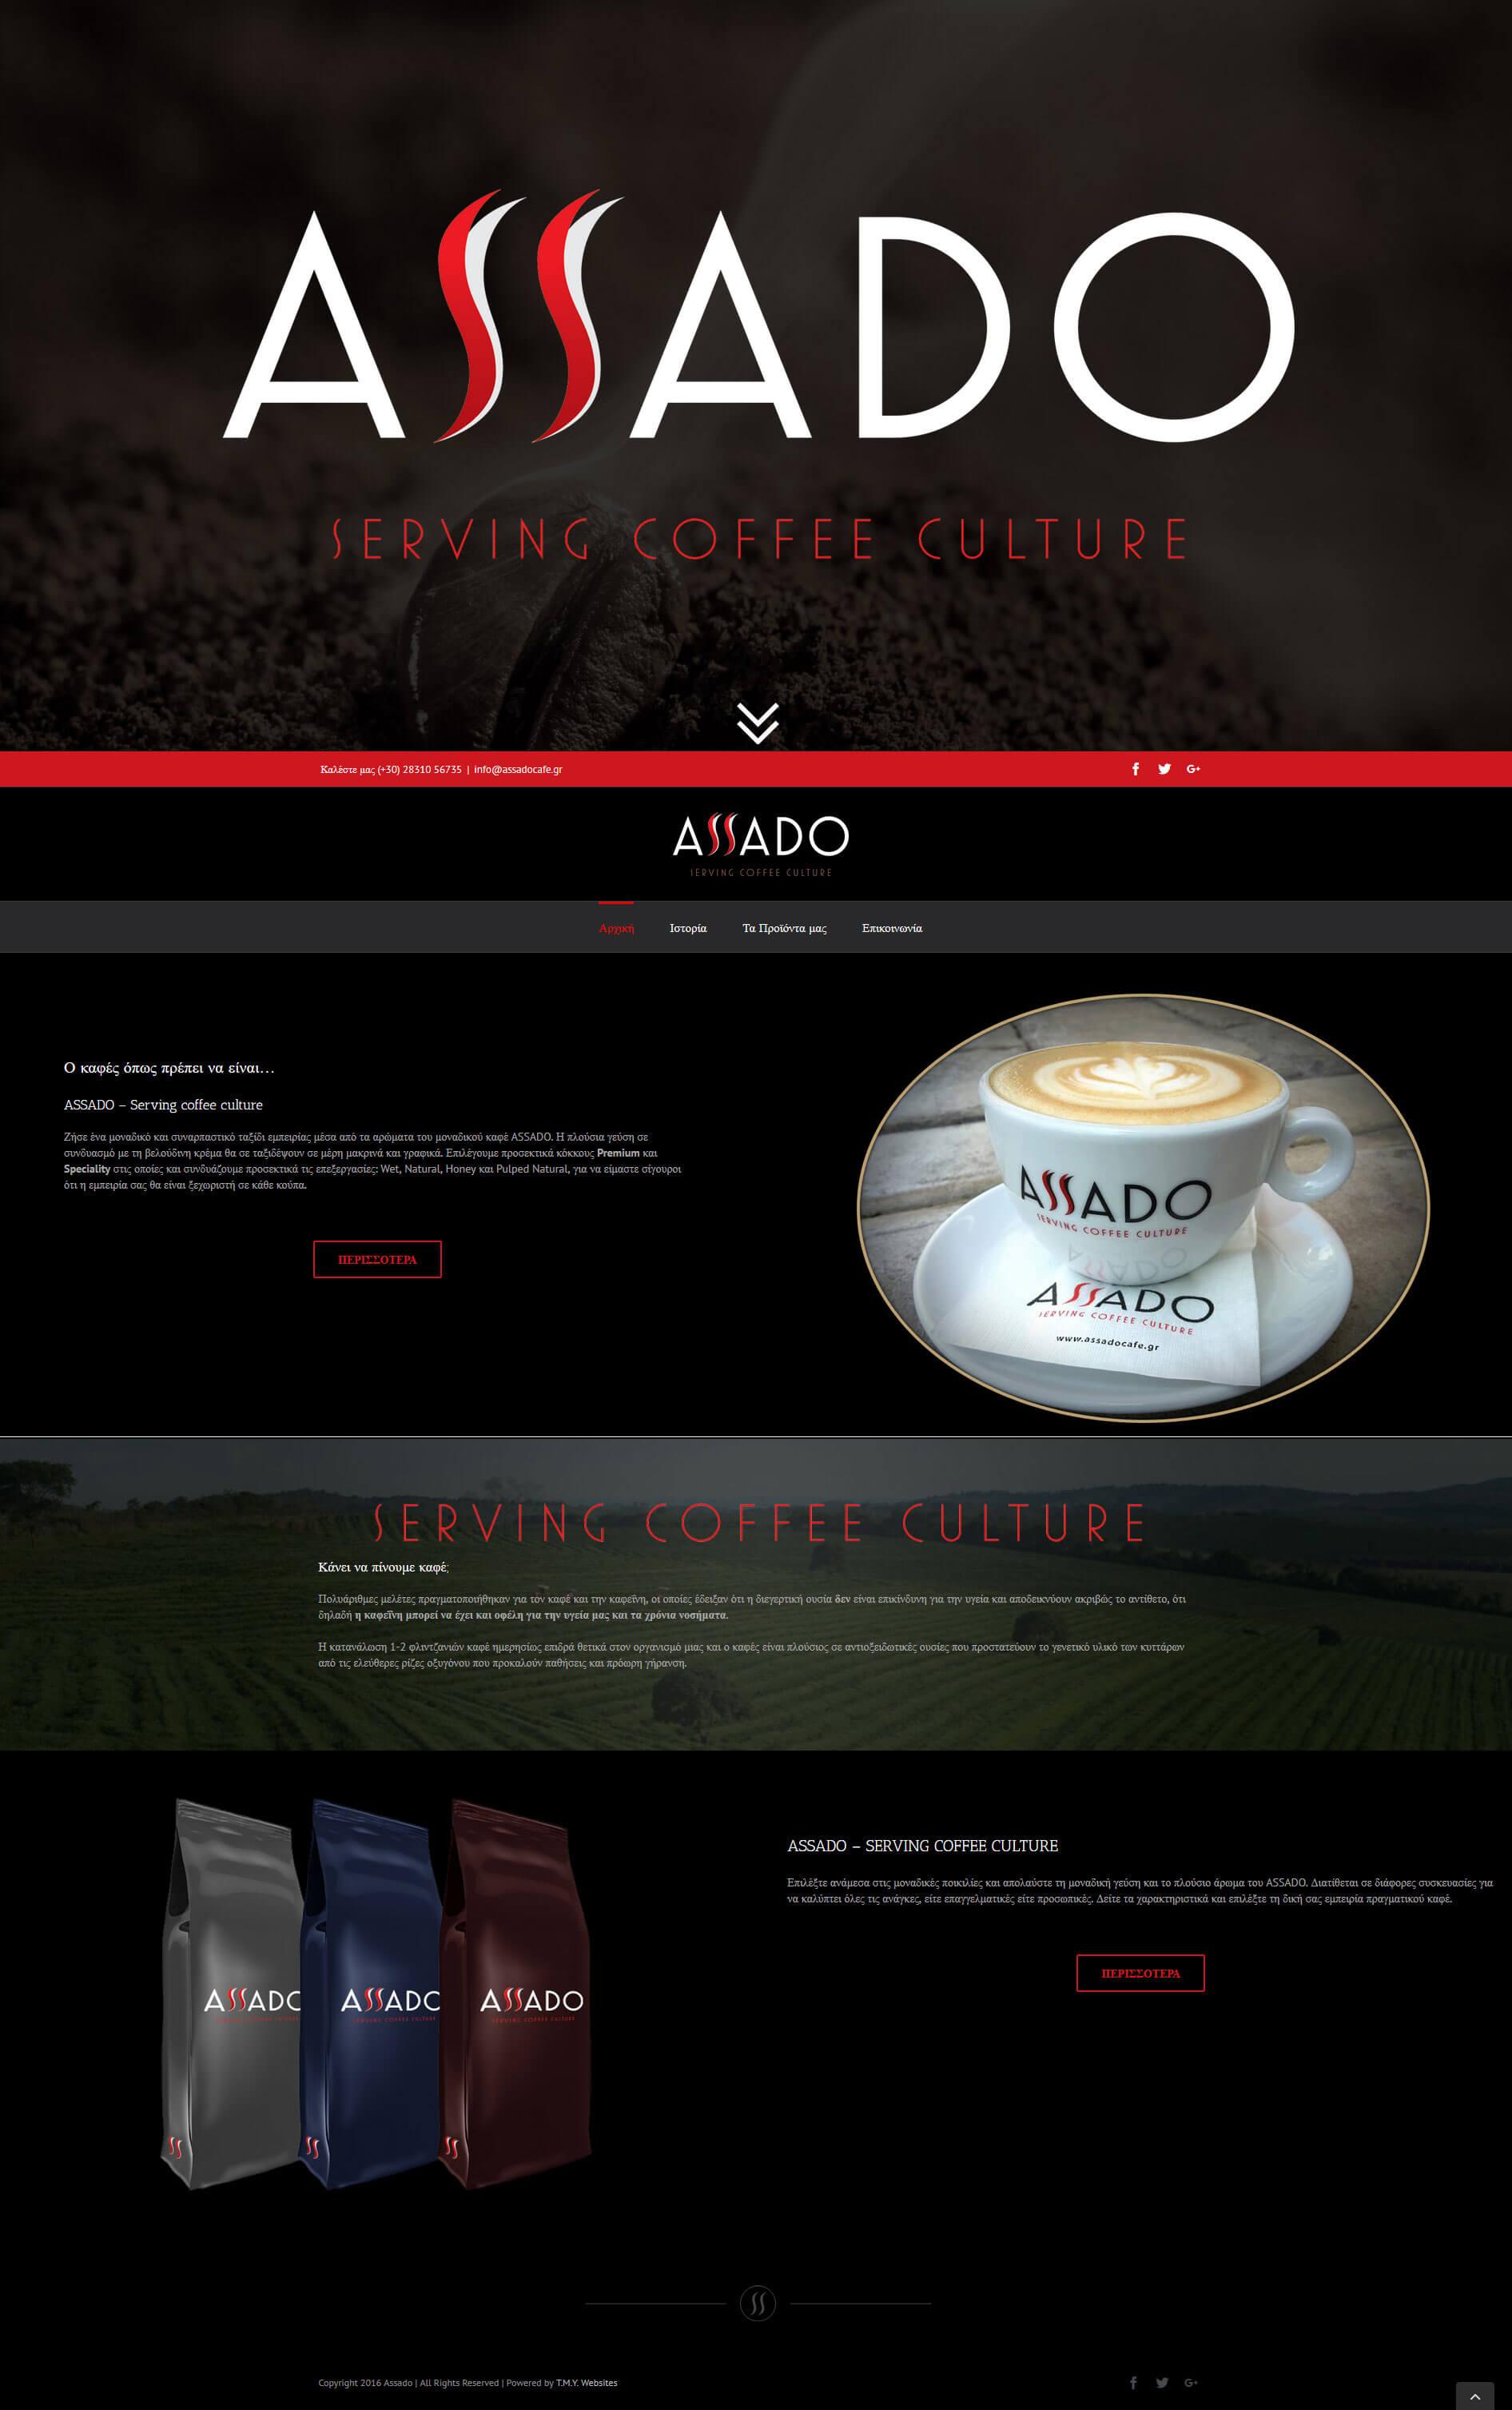 Assado Coffee - Homepage